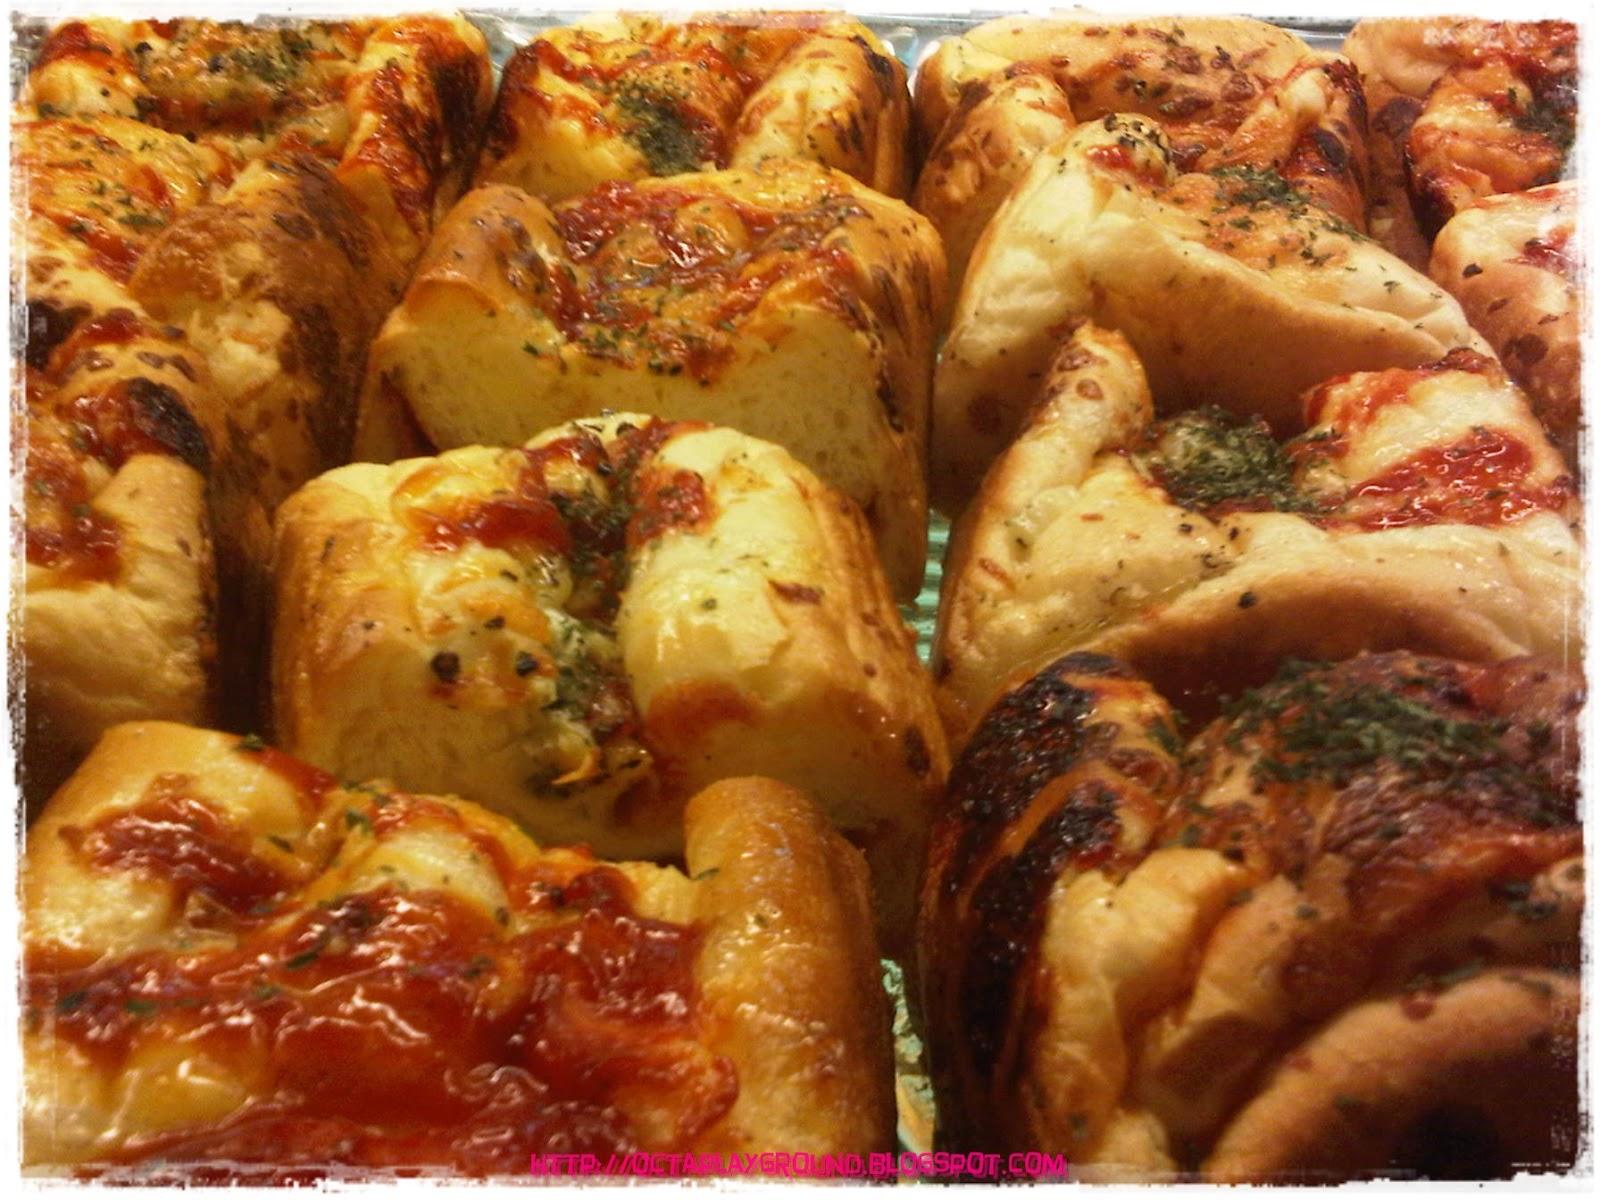 Kue tart di bread talk 2014 resepmakanan info click for details kue